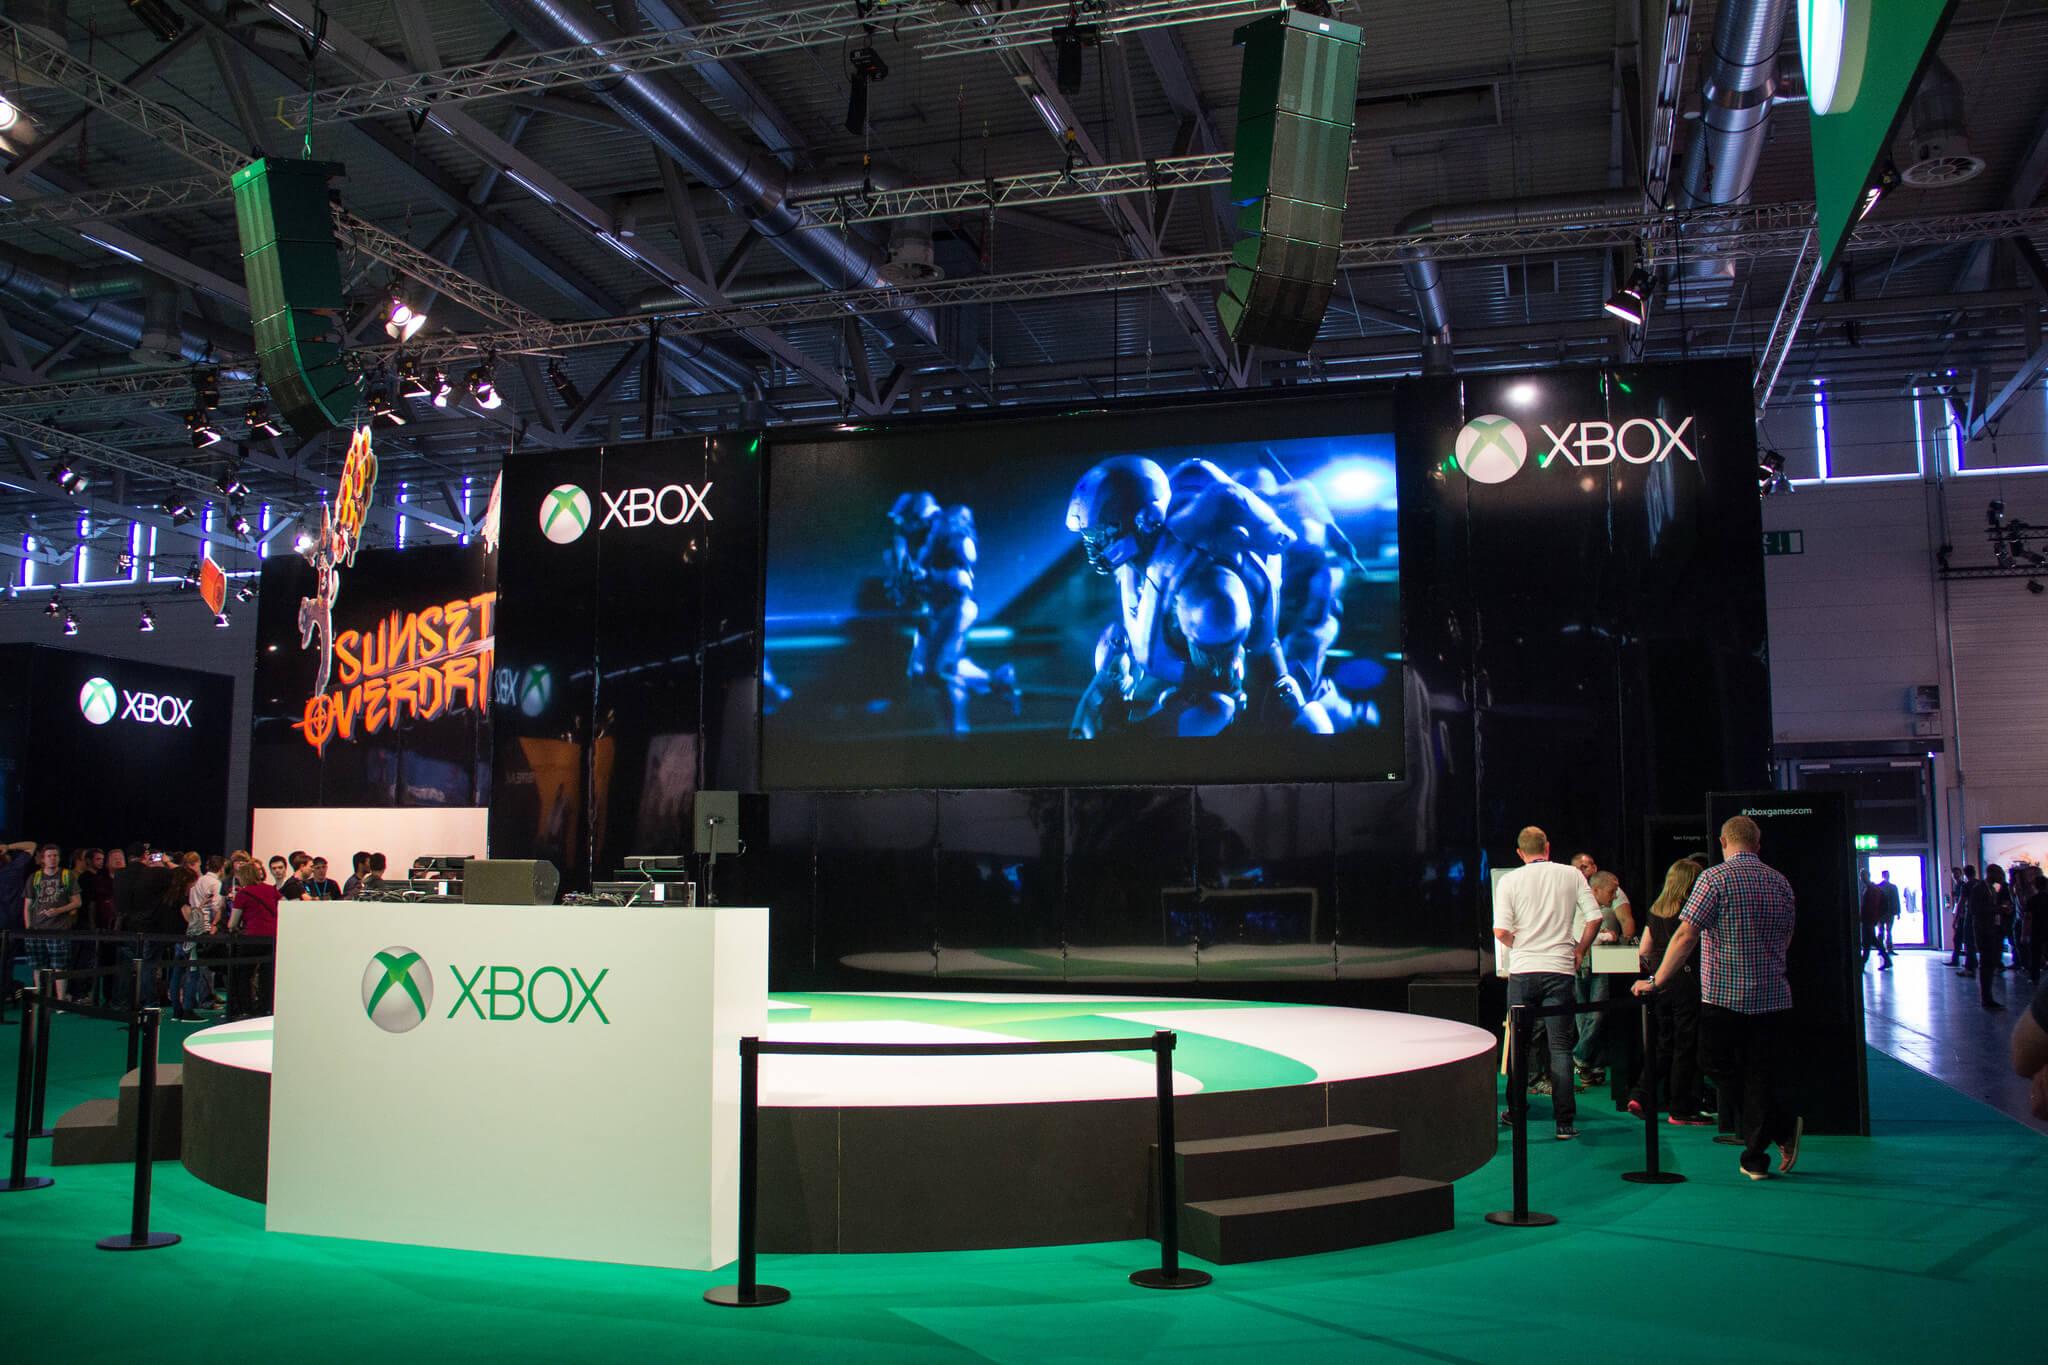 Microsoft Xbox One steigert Verkaufszahlen um 100% 1